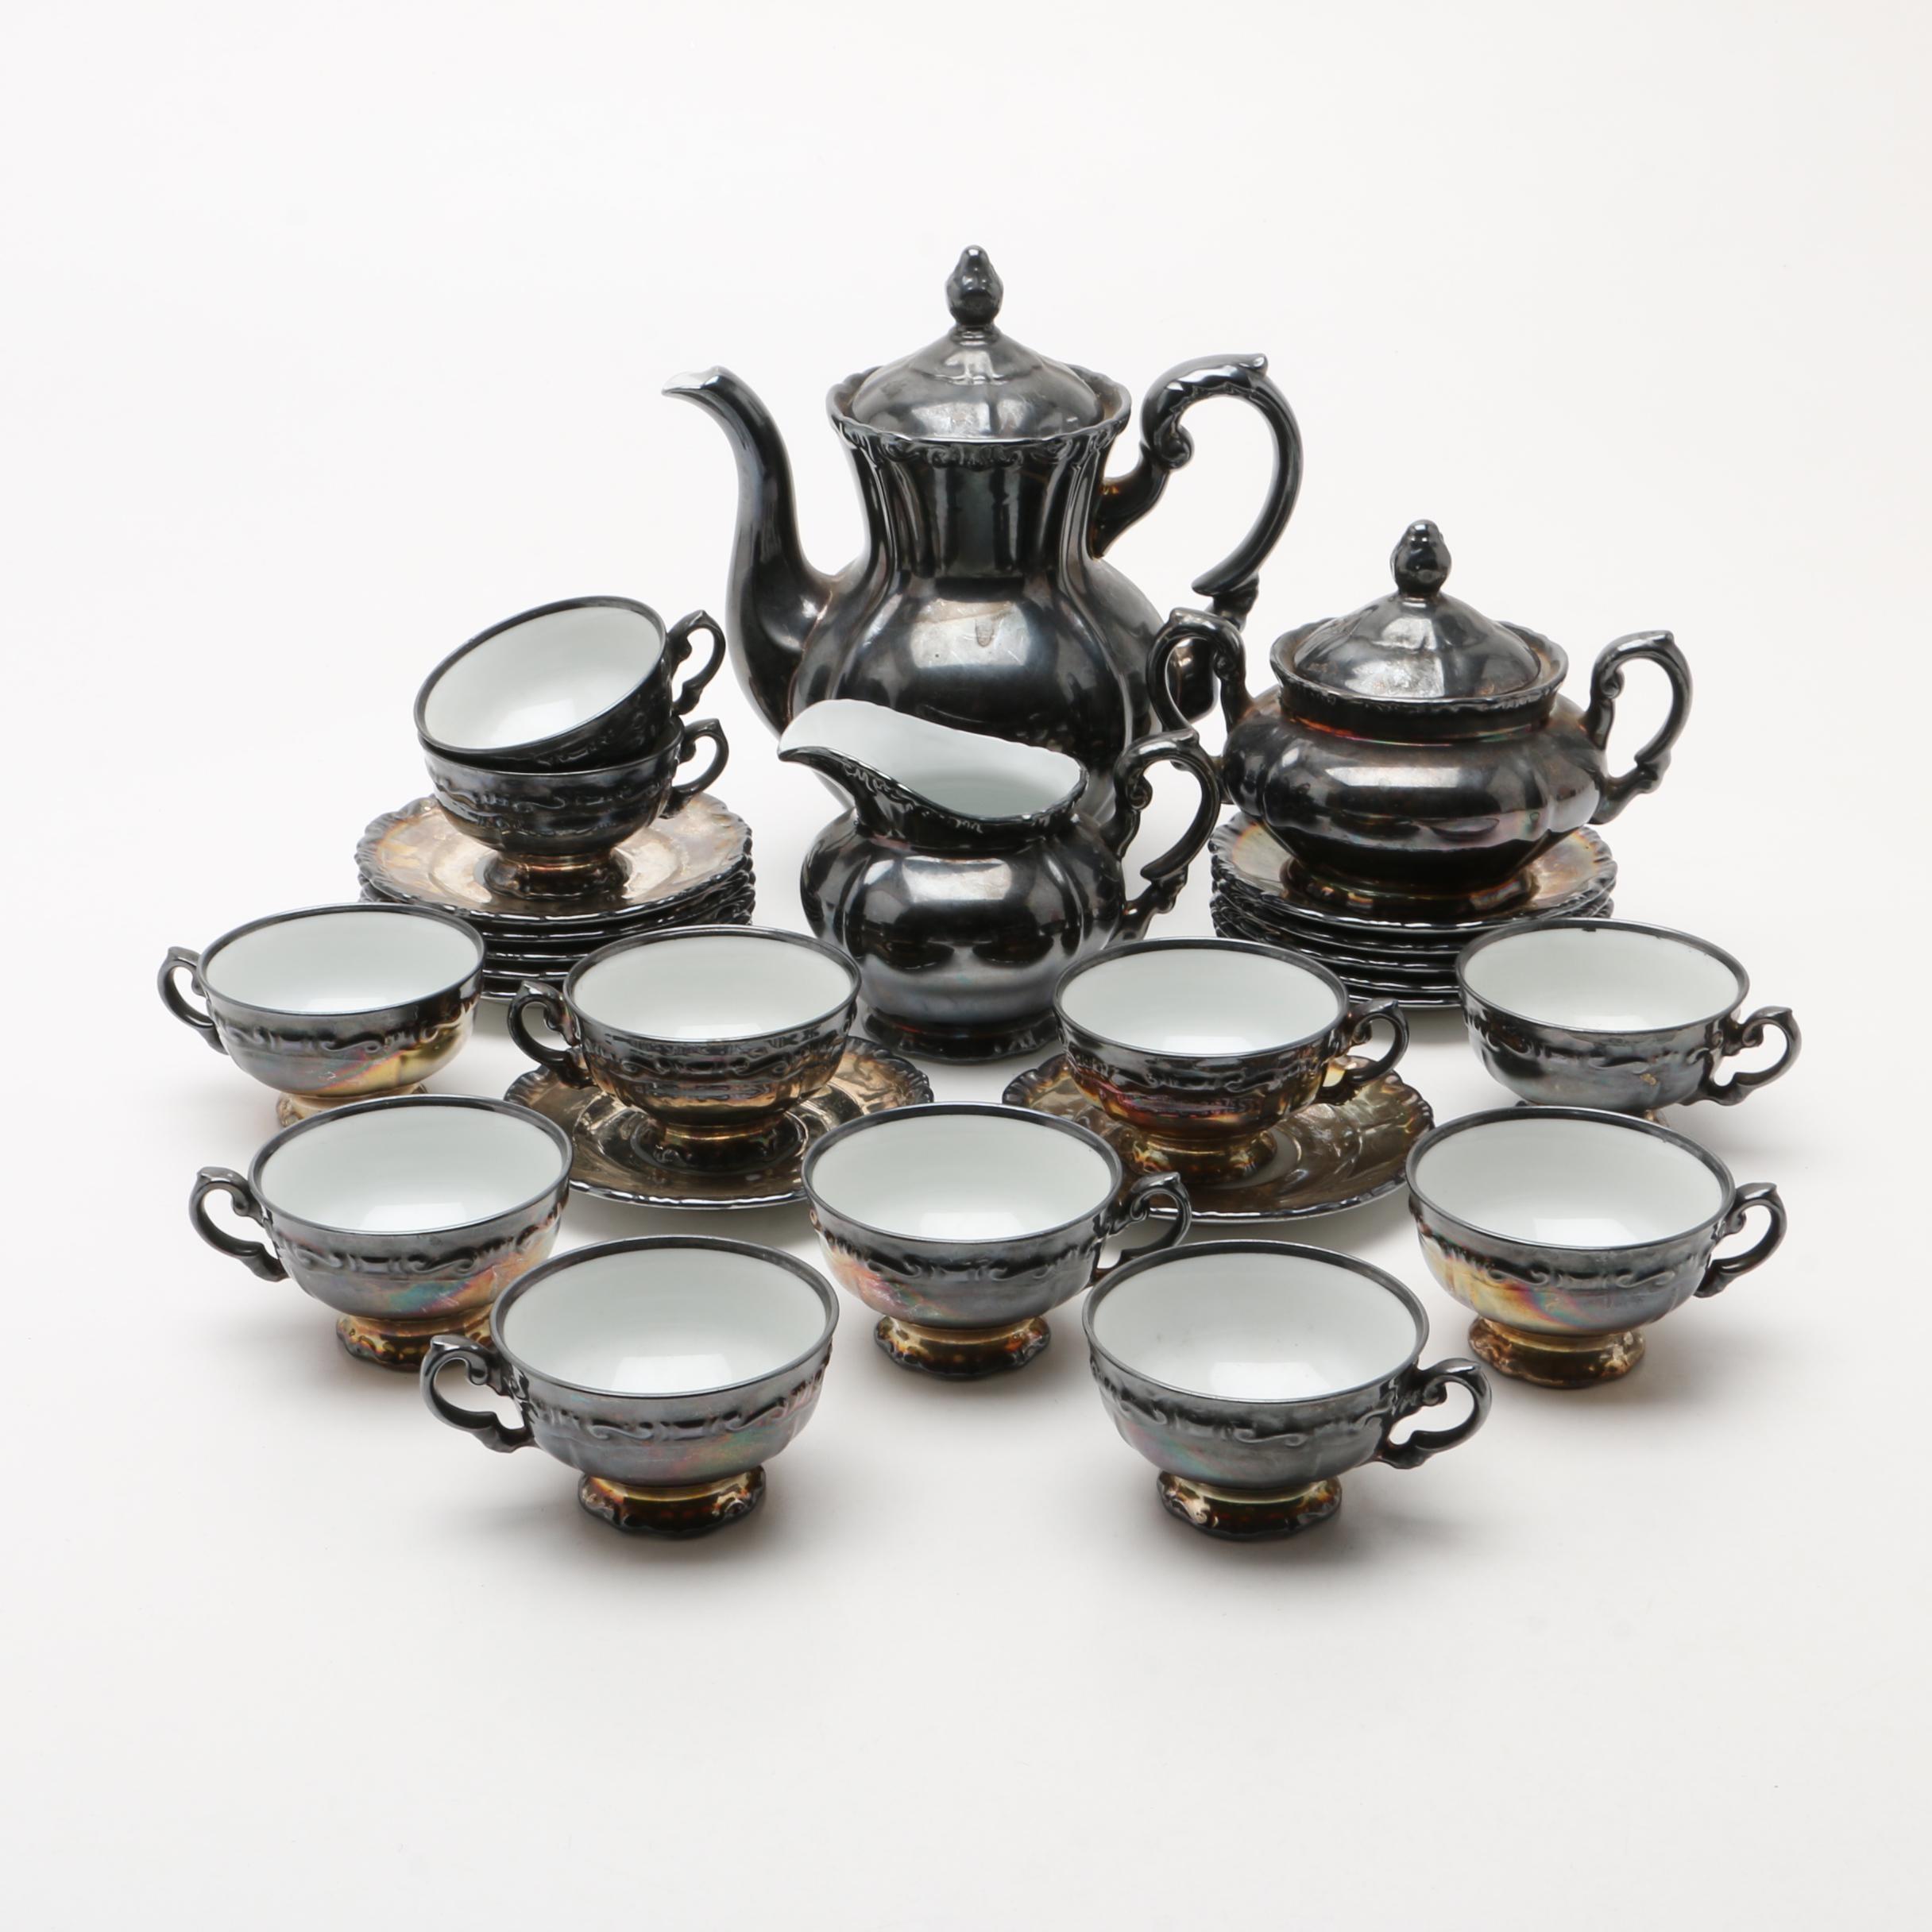 A German Silver Luster Porcelain Tea Service by Heinrich, 20th Century